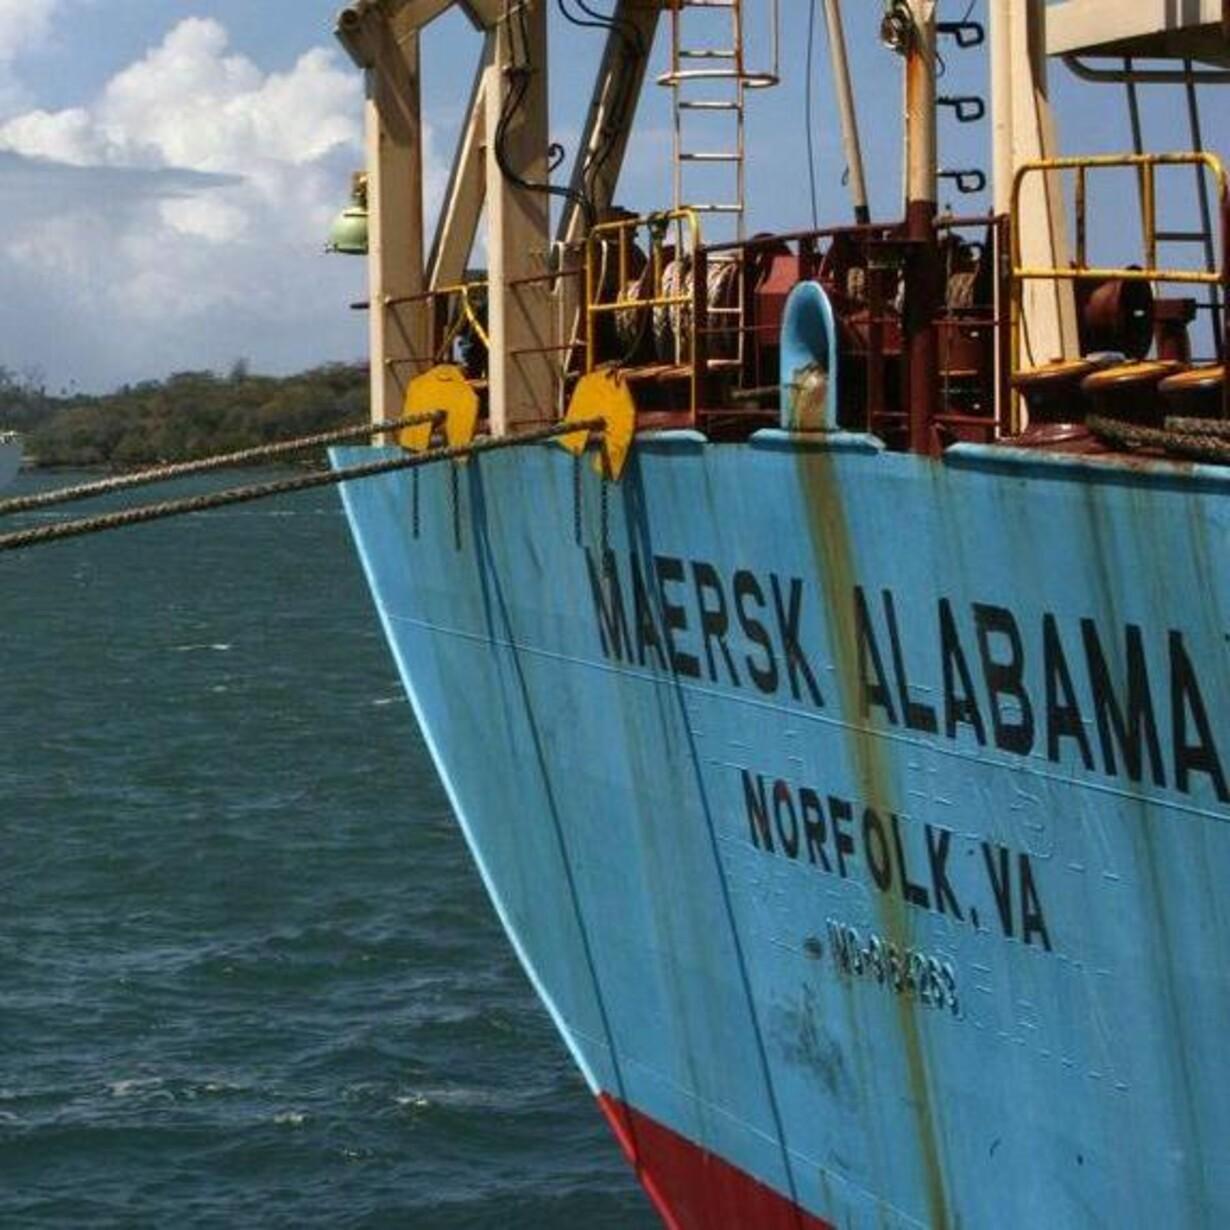 pix-maersk alabama-biz